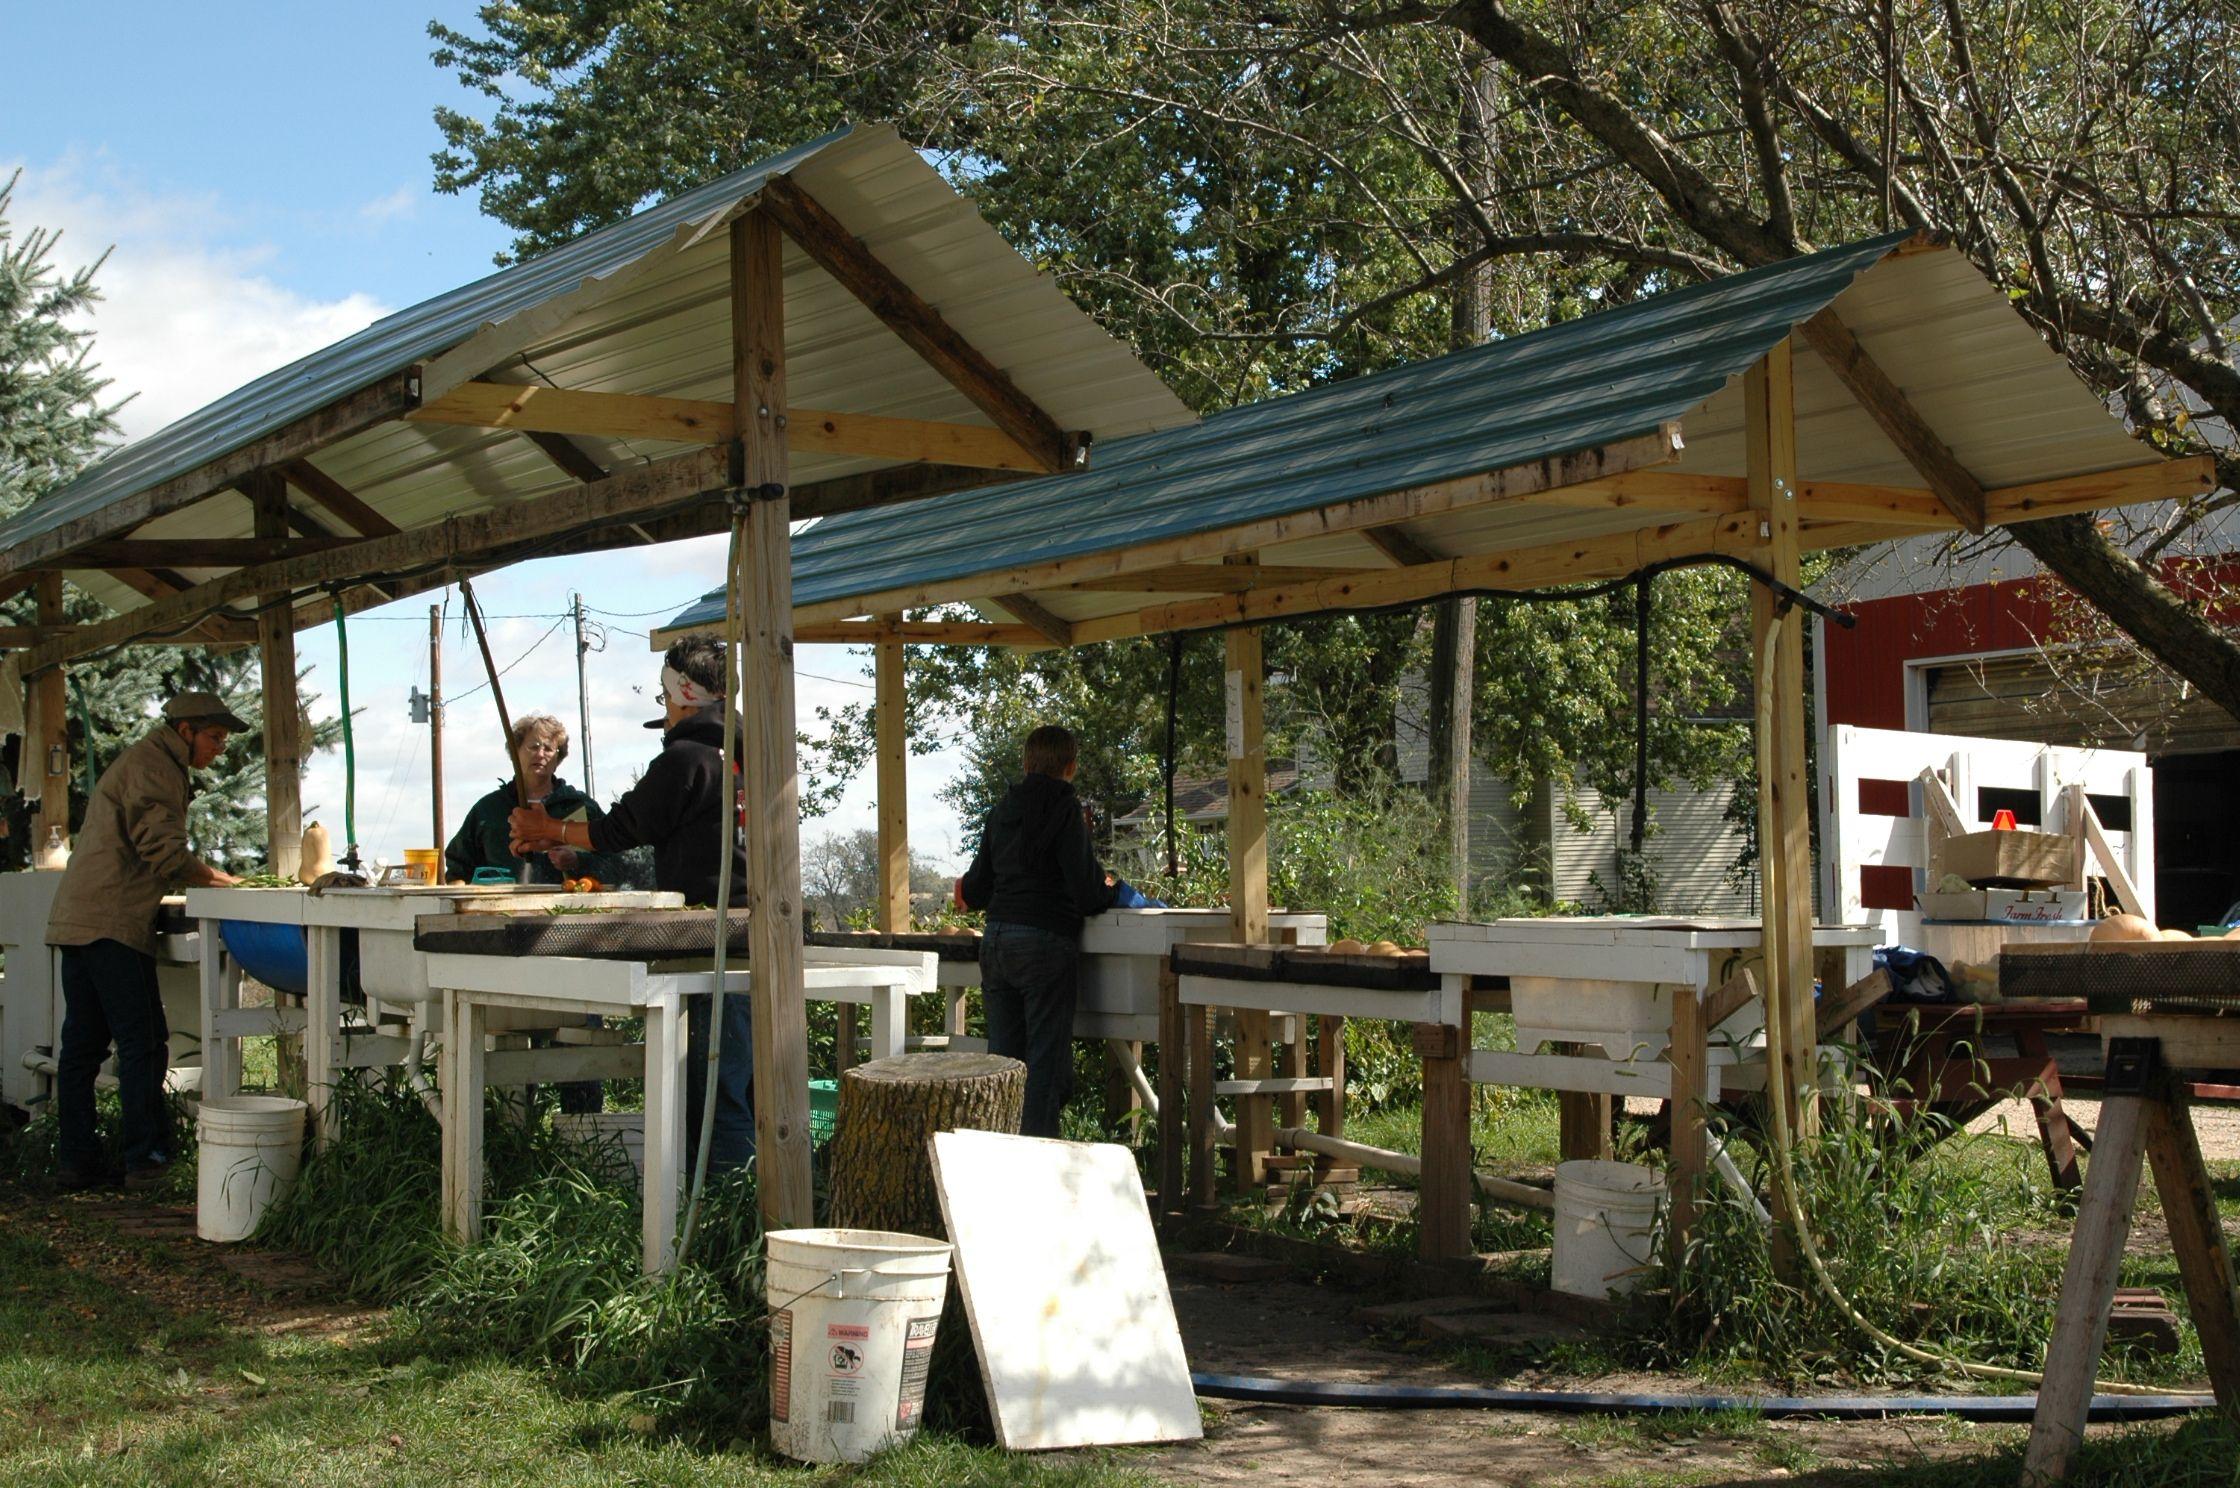 vegetable washing station | farm projects | Pinterest | Farming ...